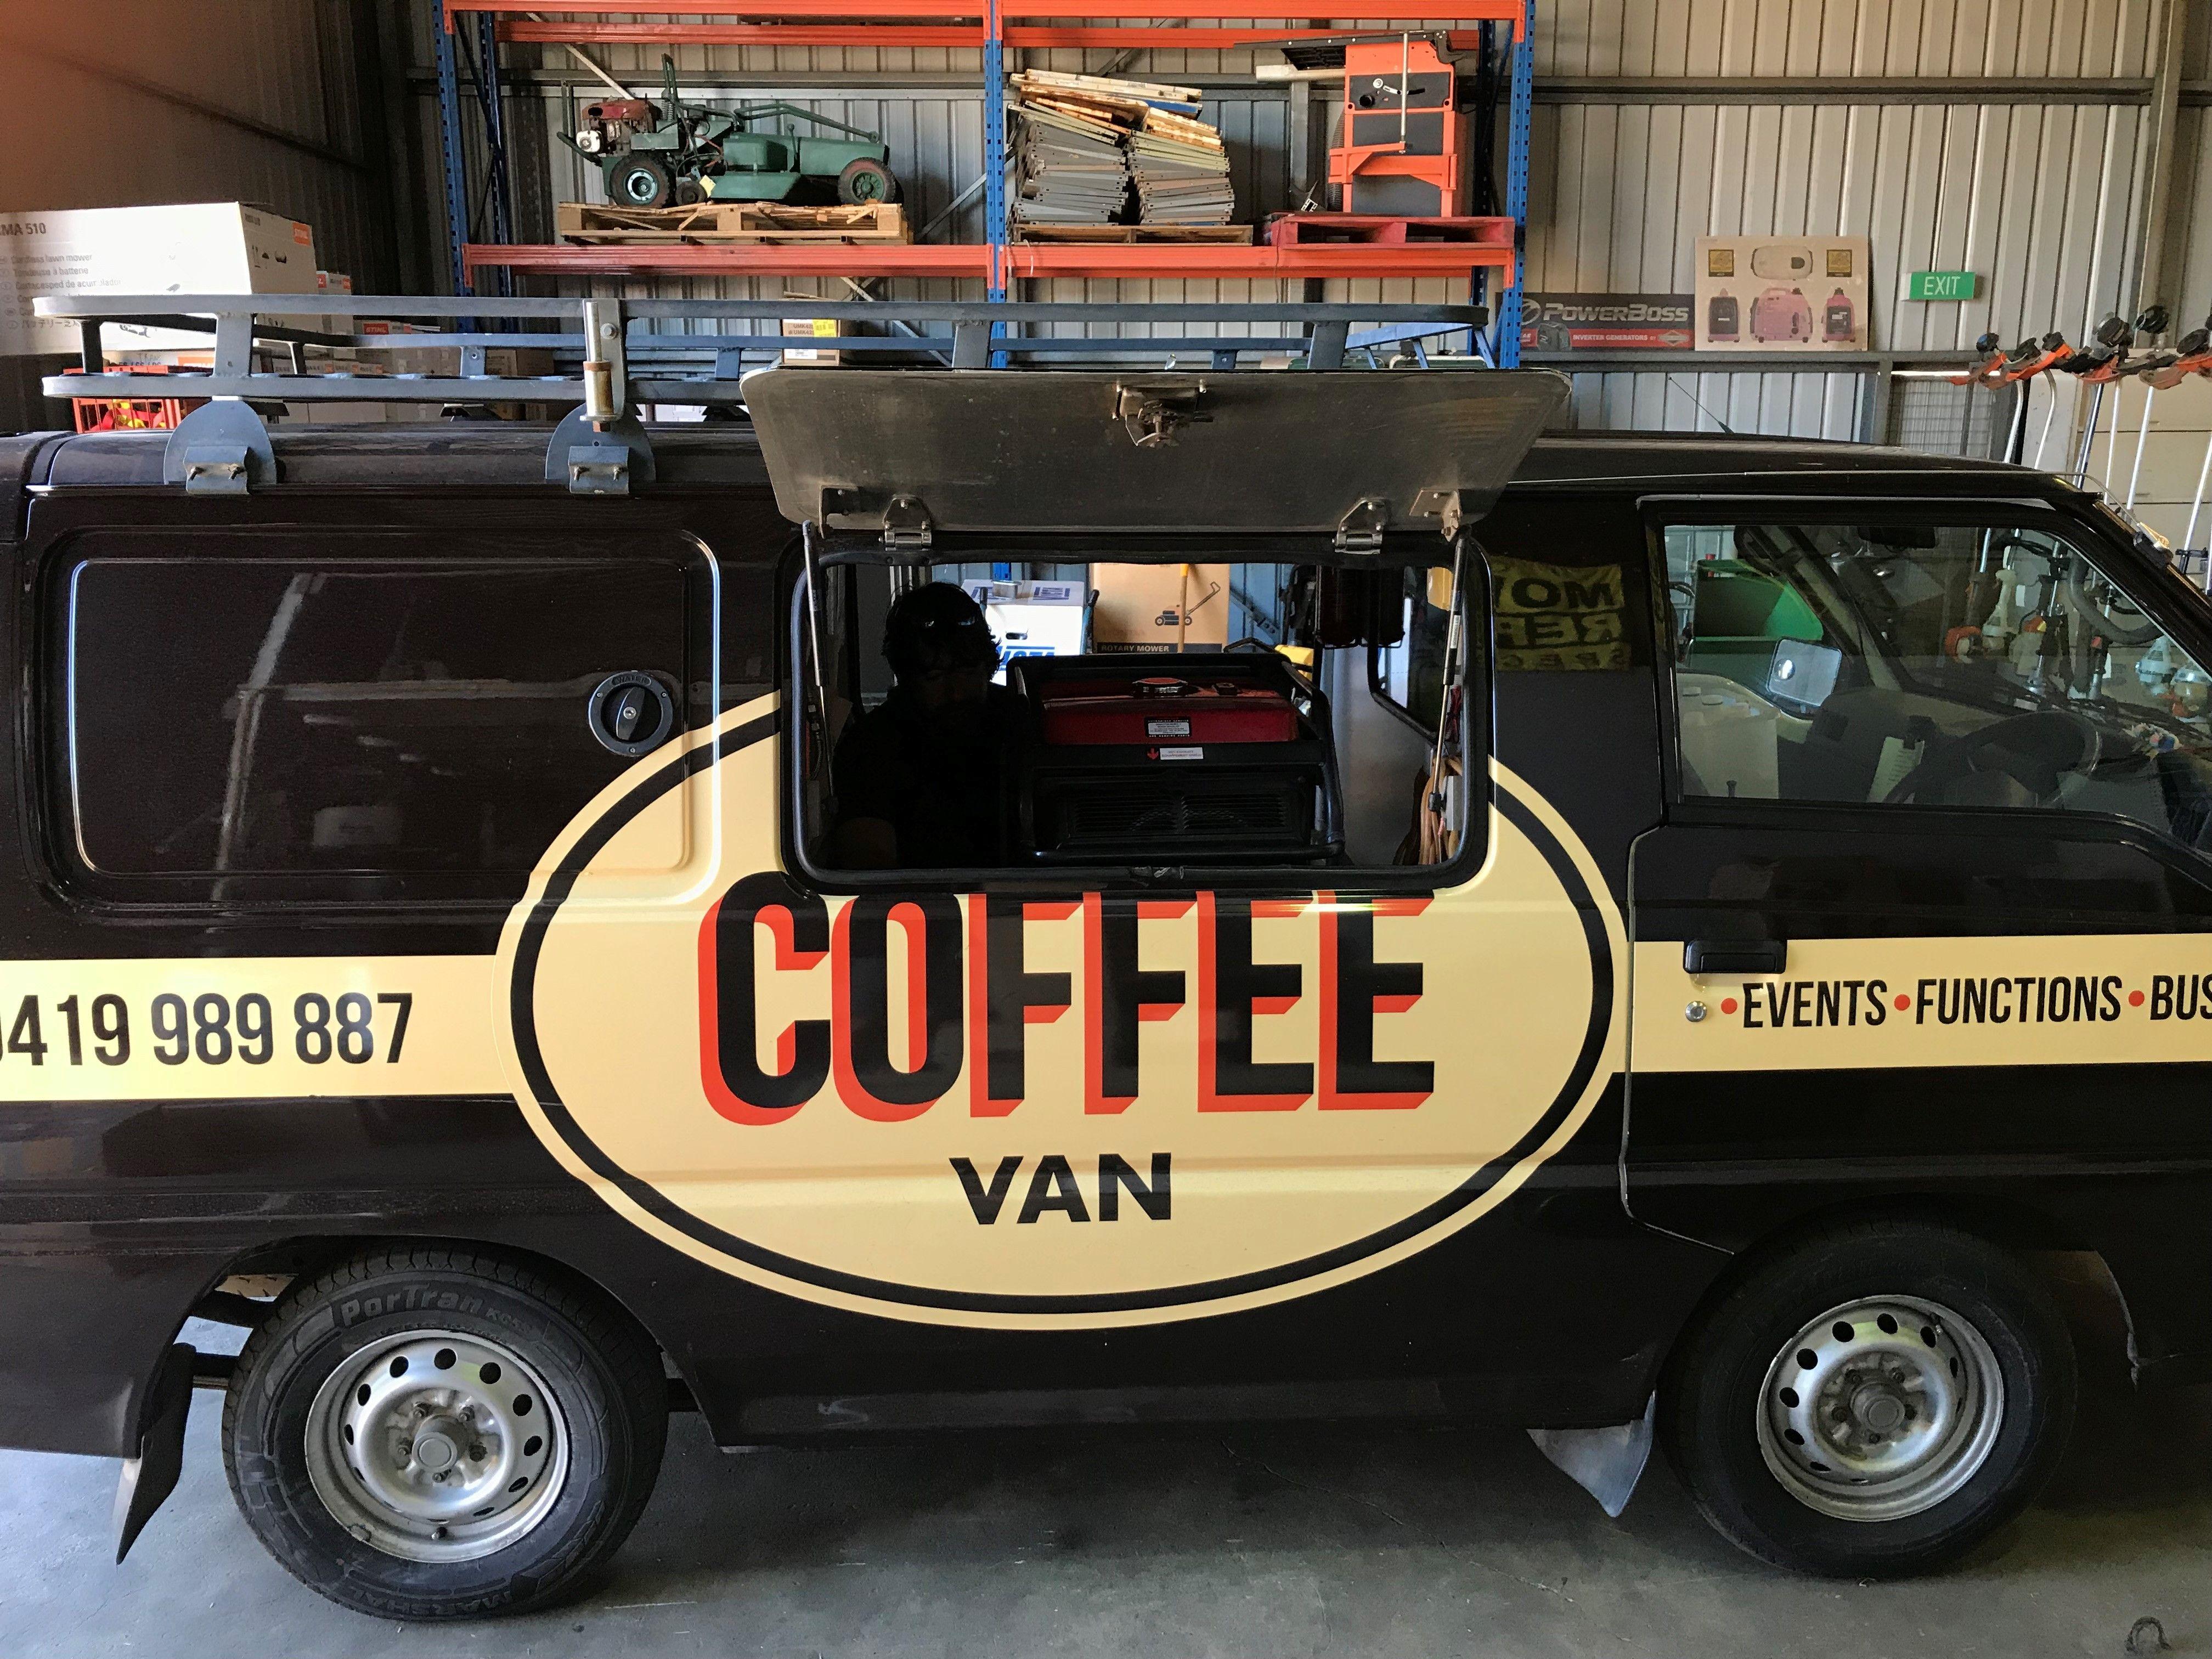 Technician Darren is making sure the Honda Generator in Geraldton's Coffee Van is spot on. Thousands of tired Gero Coffee lovers rely on you mate.    #geraldtoncoffeevan #hondapowerequipment #em50 #Generator #geraldtonmowers #gerladton #weareyardsinfront #hondapower #hondadealer #authoriseddealer #geraldtoncoffee @hondapowerequipmentau